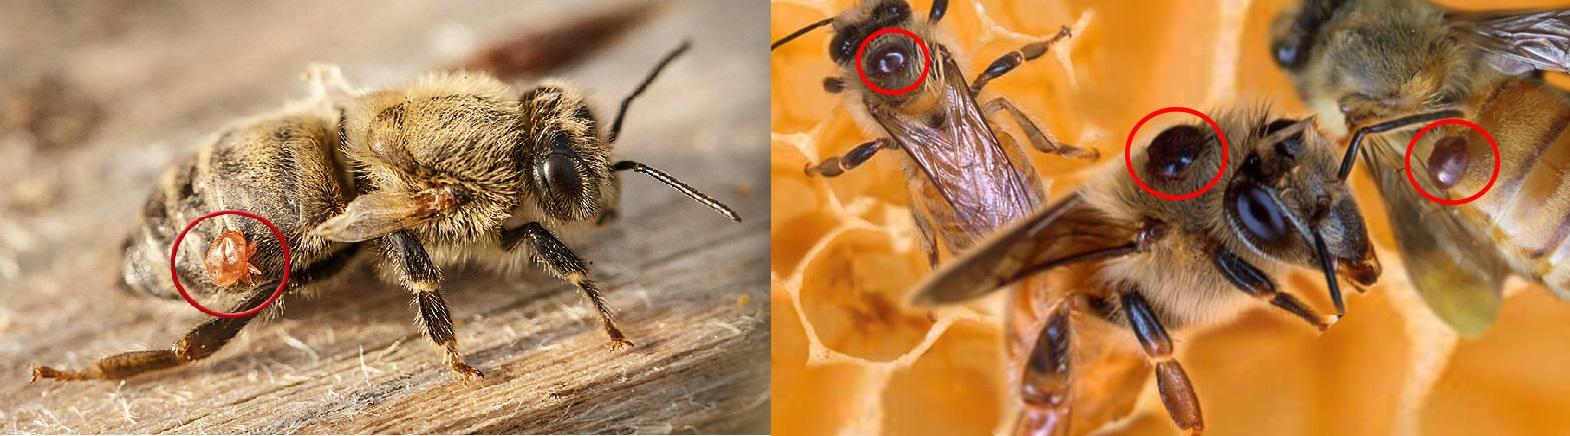 клещ варроа на пчеле